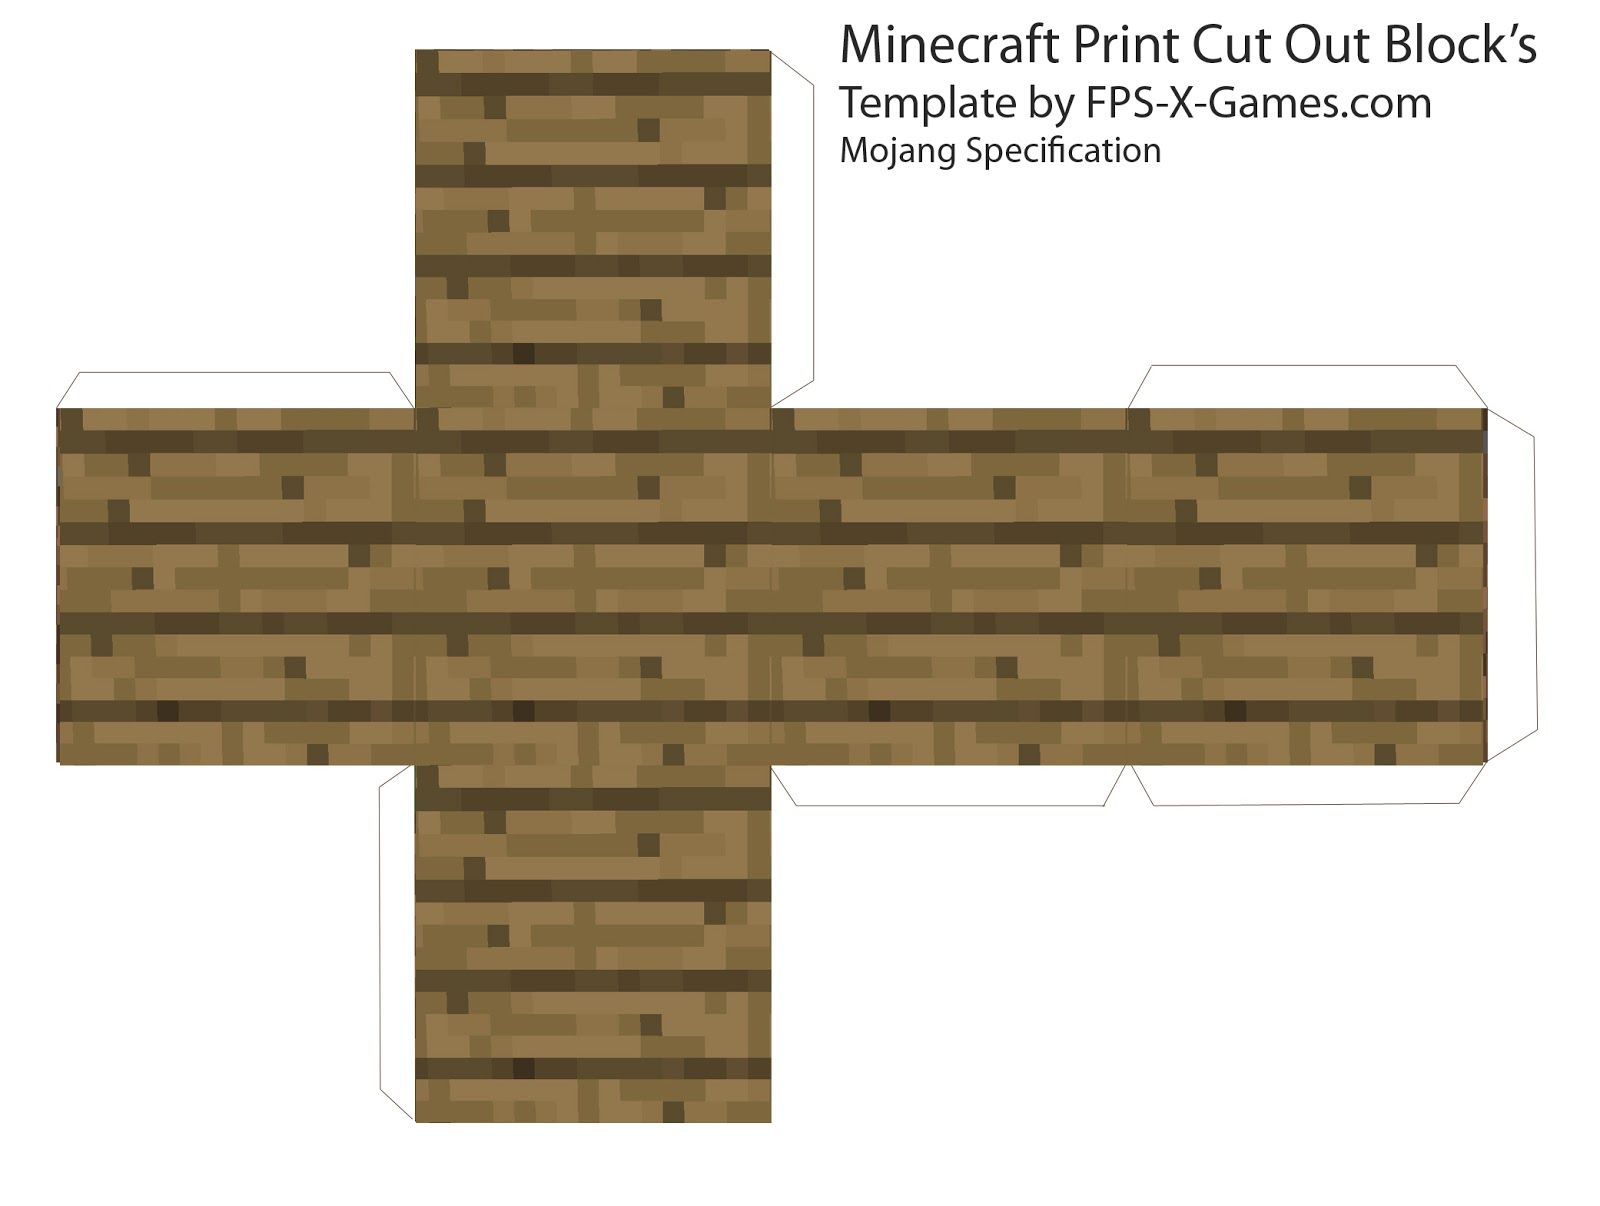 Minecraft Wood Plank Block Papercraft Cut Out